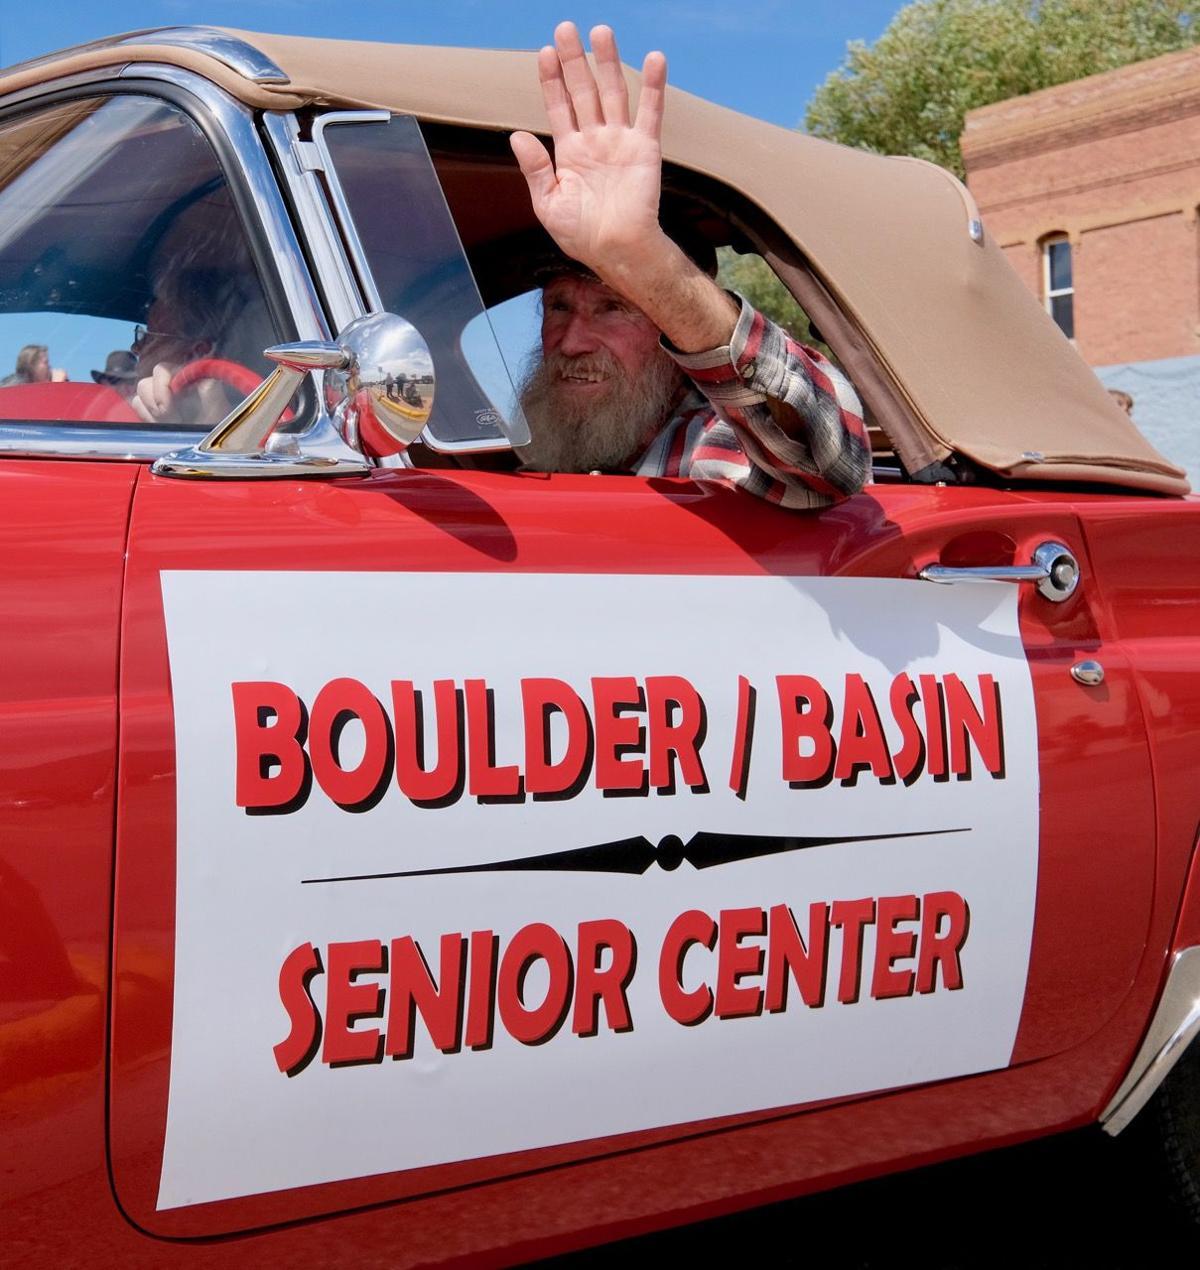 082819 Jefferson County Fair and Rodeo parade senior center.jpg